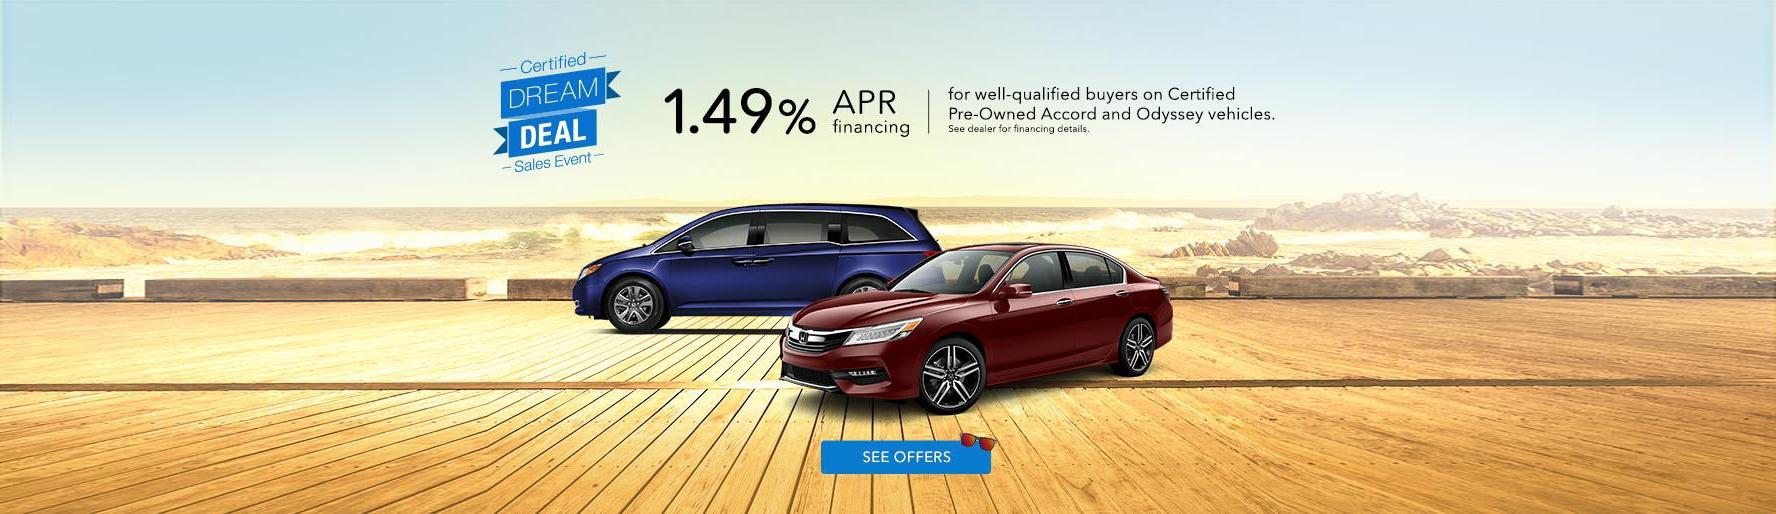 Car Dealerships In Durham Nc >> New Honda and Used Car Dealership| Serving Durham, Raleigh, Cary, Chapel Hill & Burlington NC